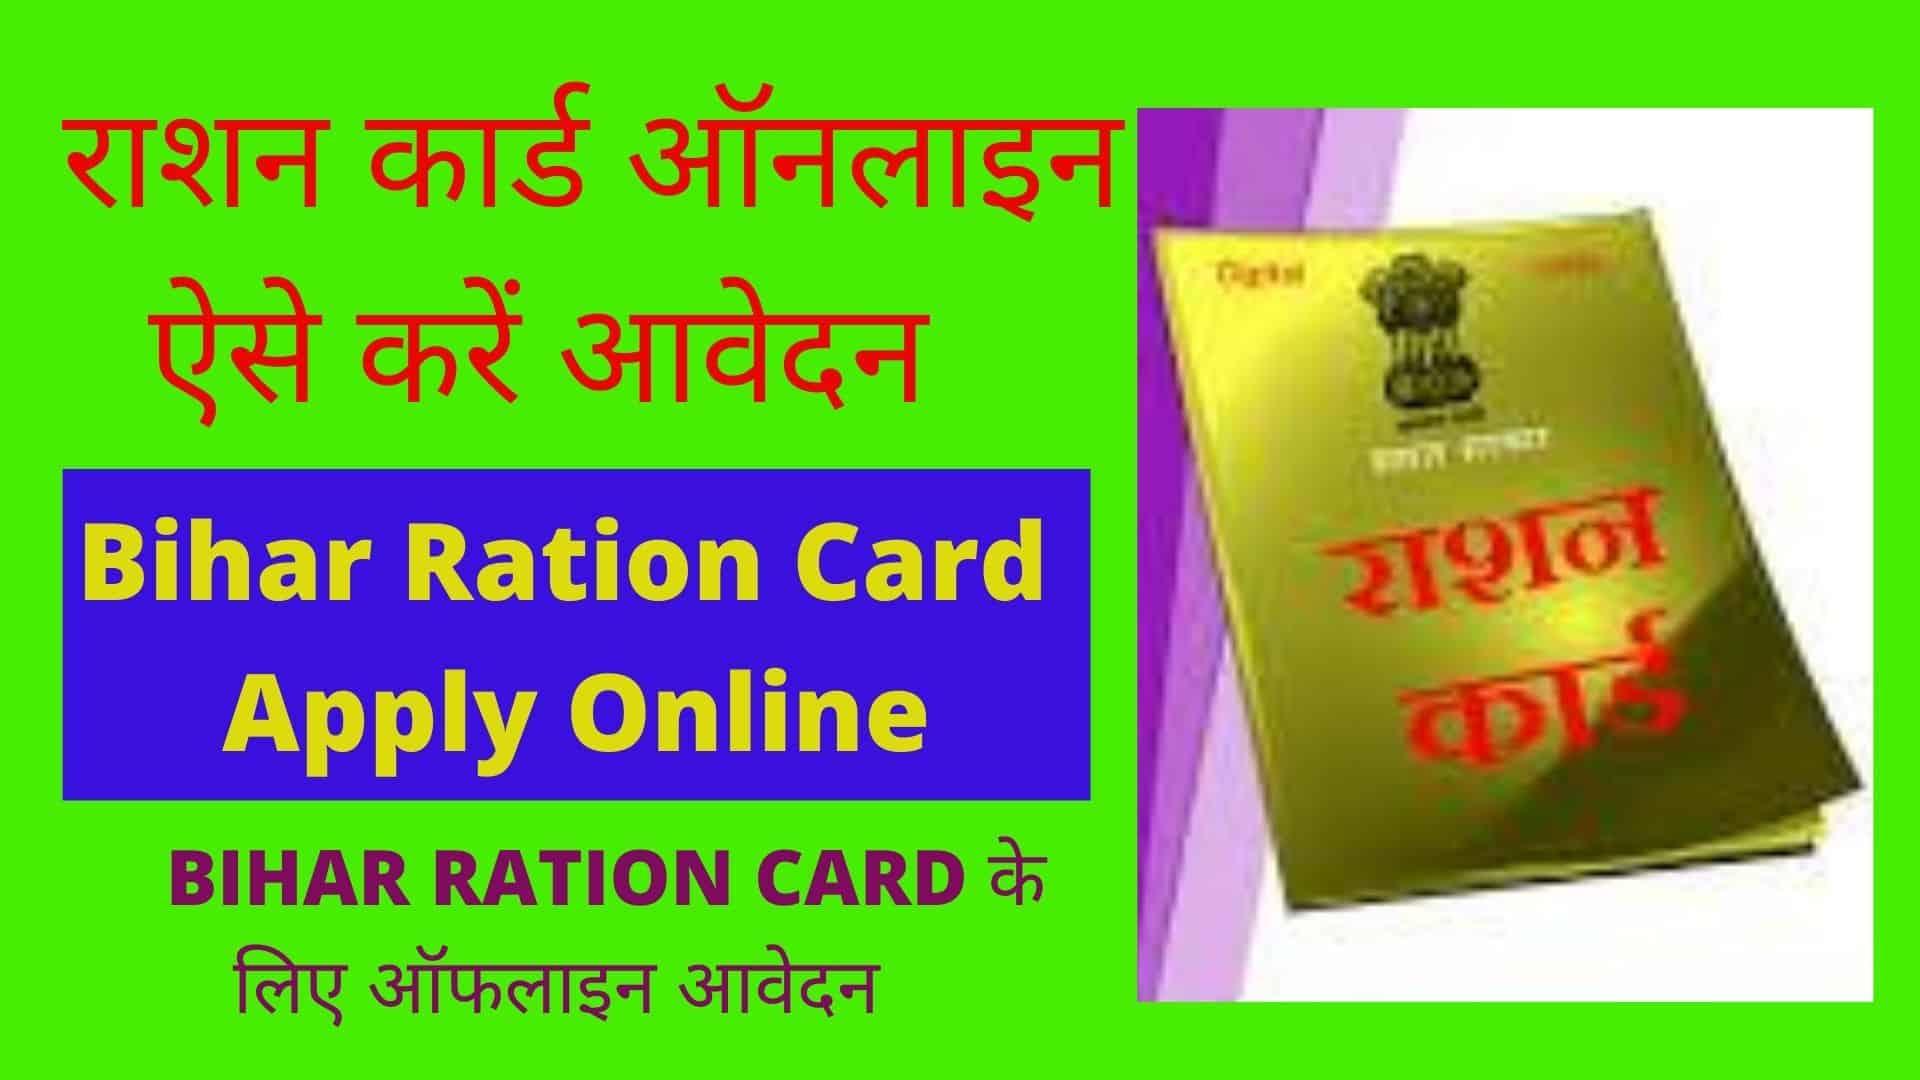 राशन कार्ड ऑनलाइन आवेदन_ Bihar Ration Card Apply Online